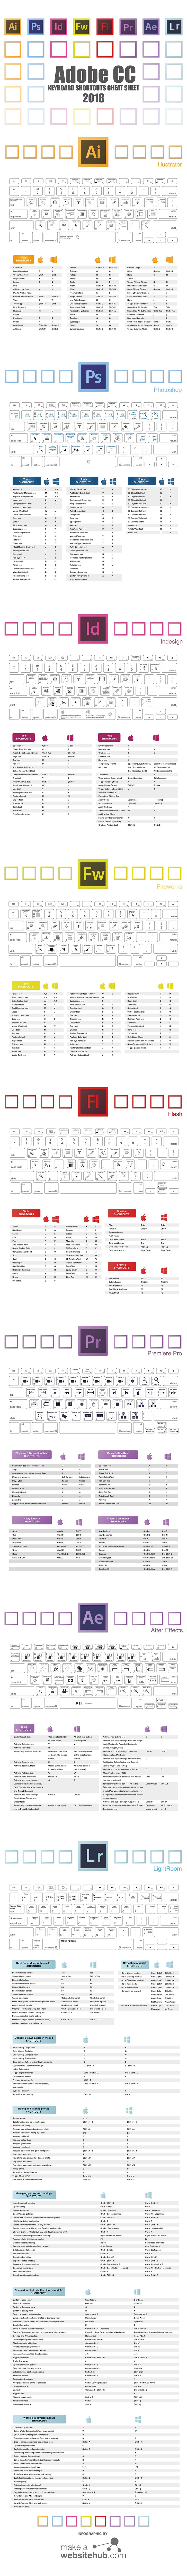 The Ultimate 2018 Adobe Creative Cloud Keyboard Shortcuts